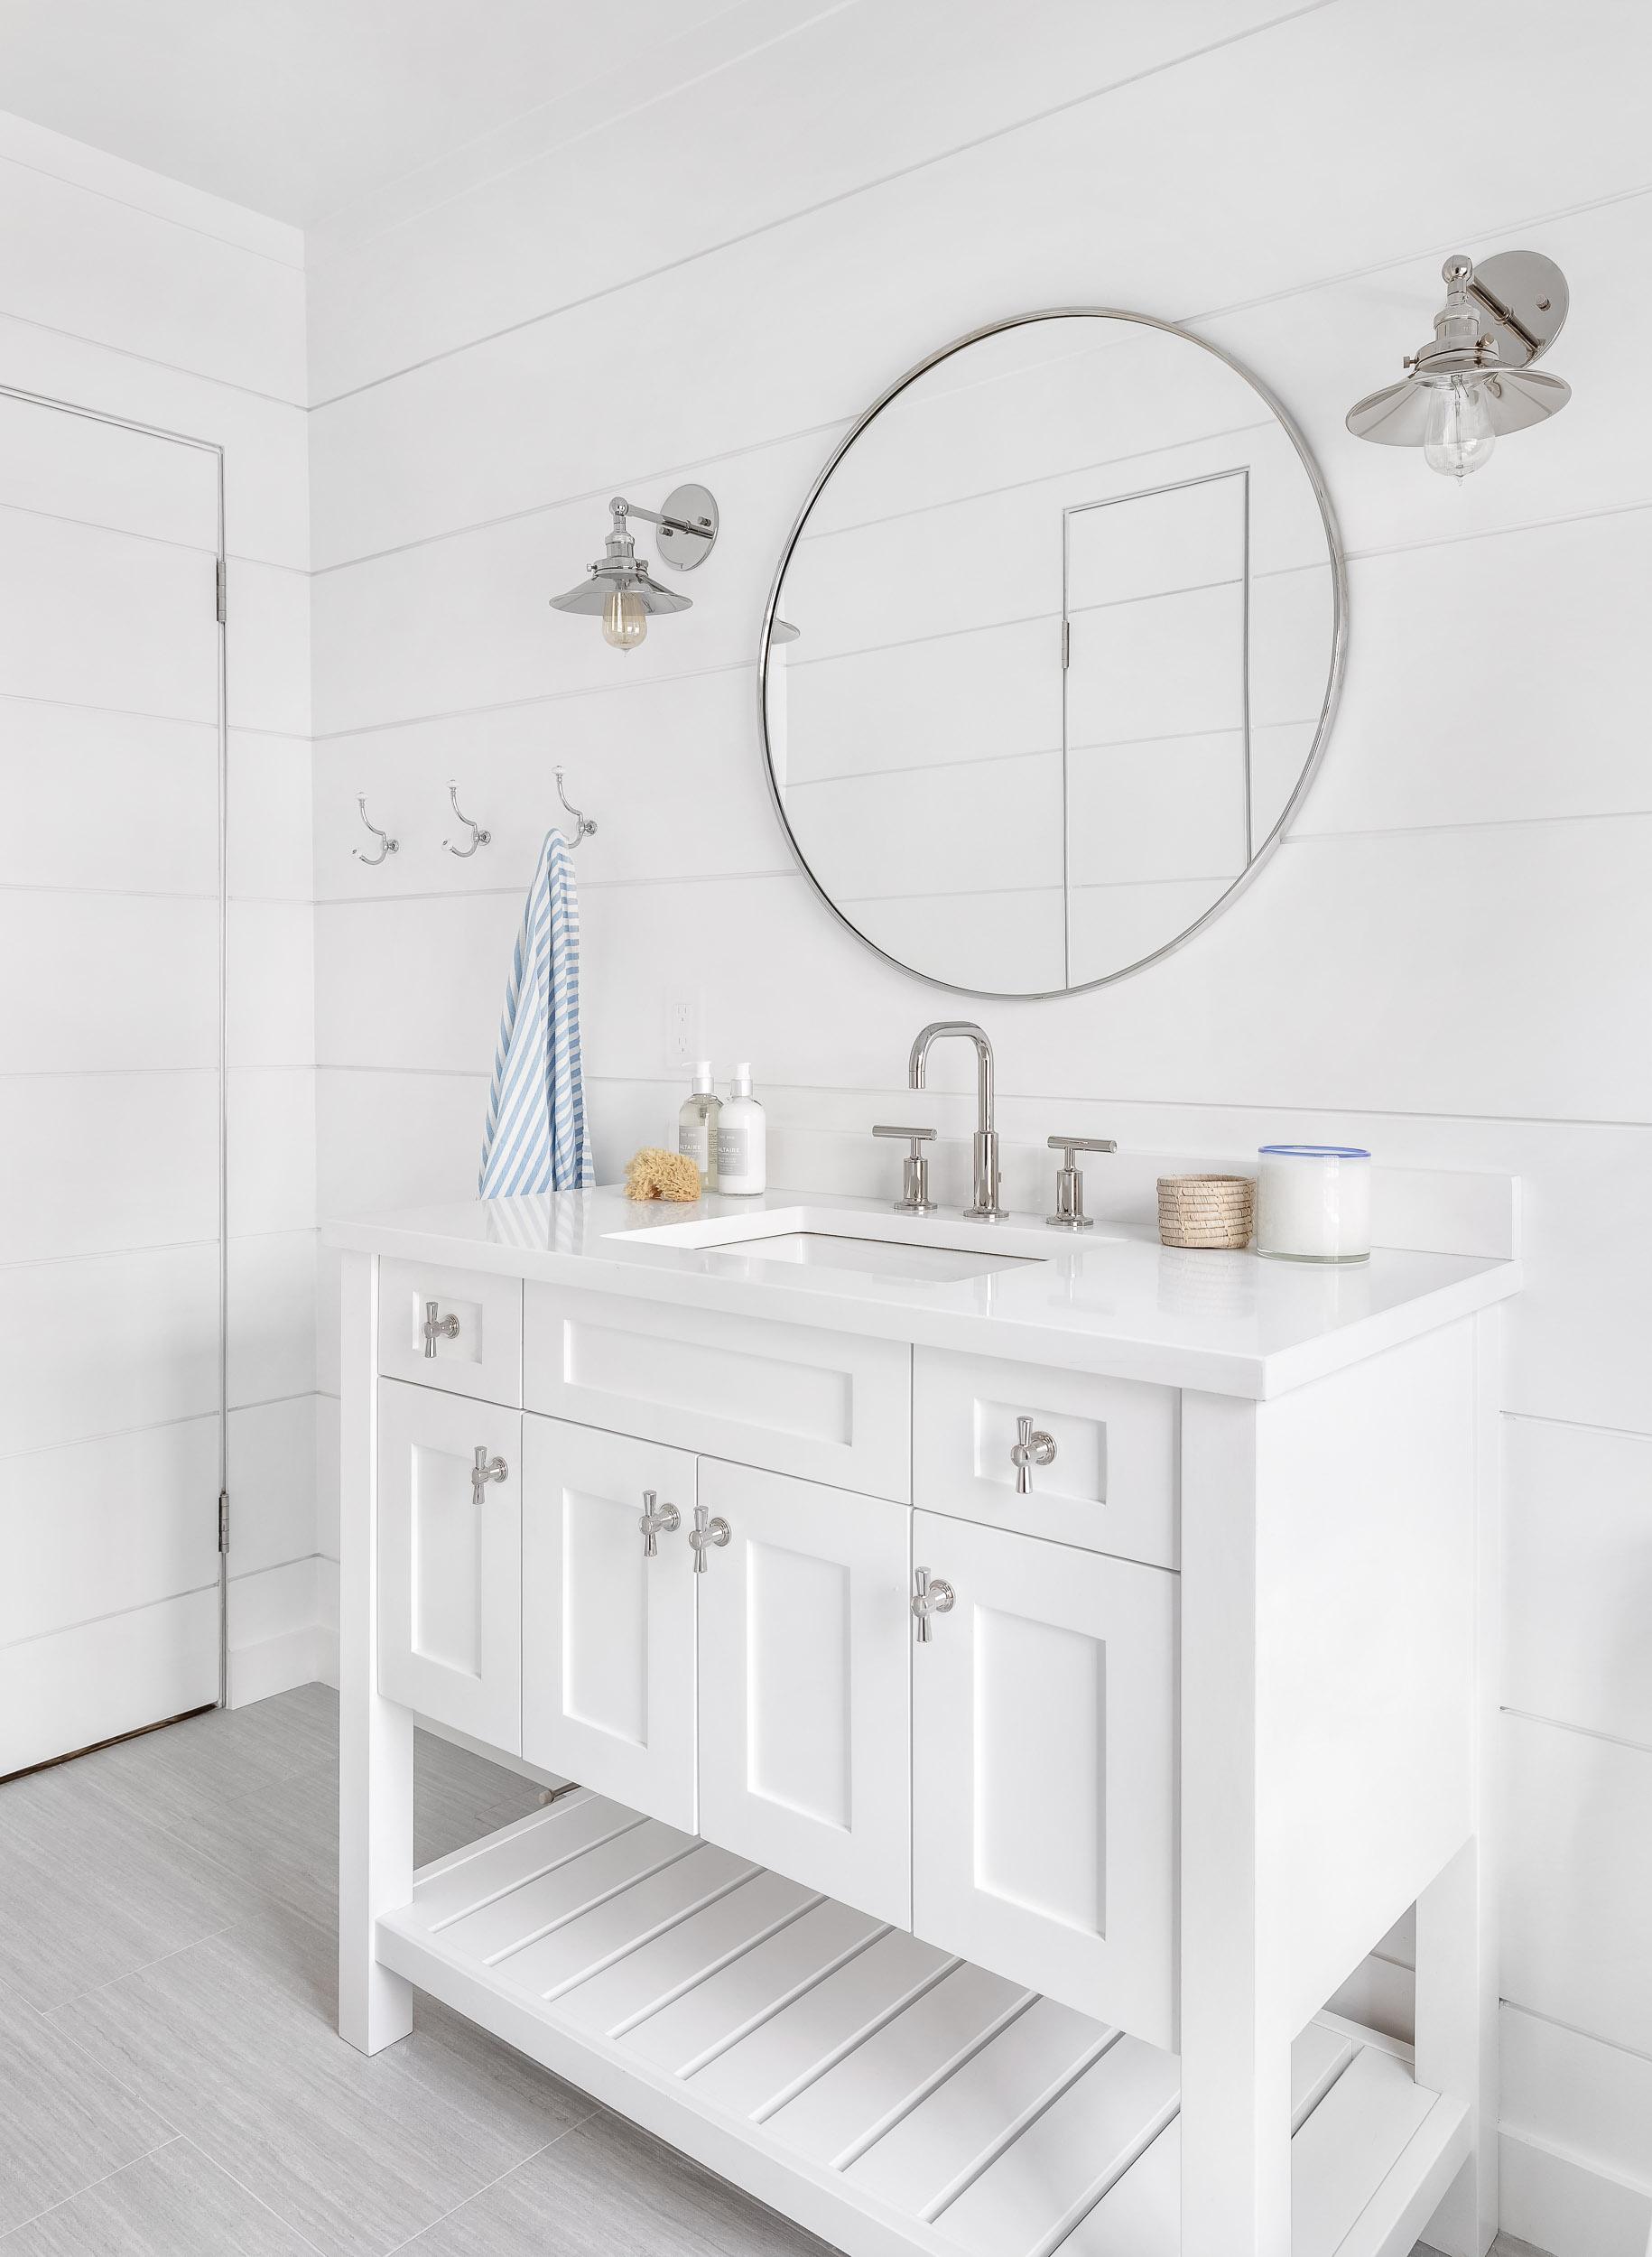 parker and parker design-interior design photography-darien ct-white bathroom-shiplap walls and vanity.jpg